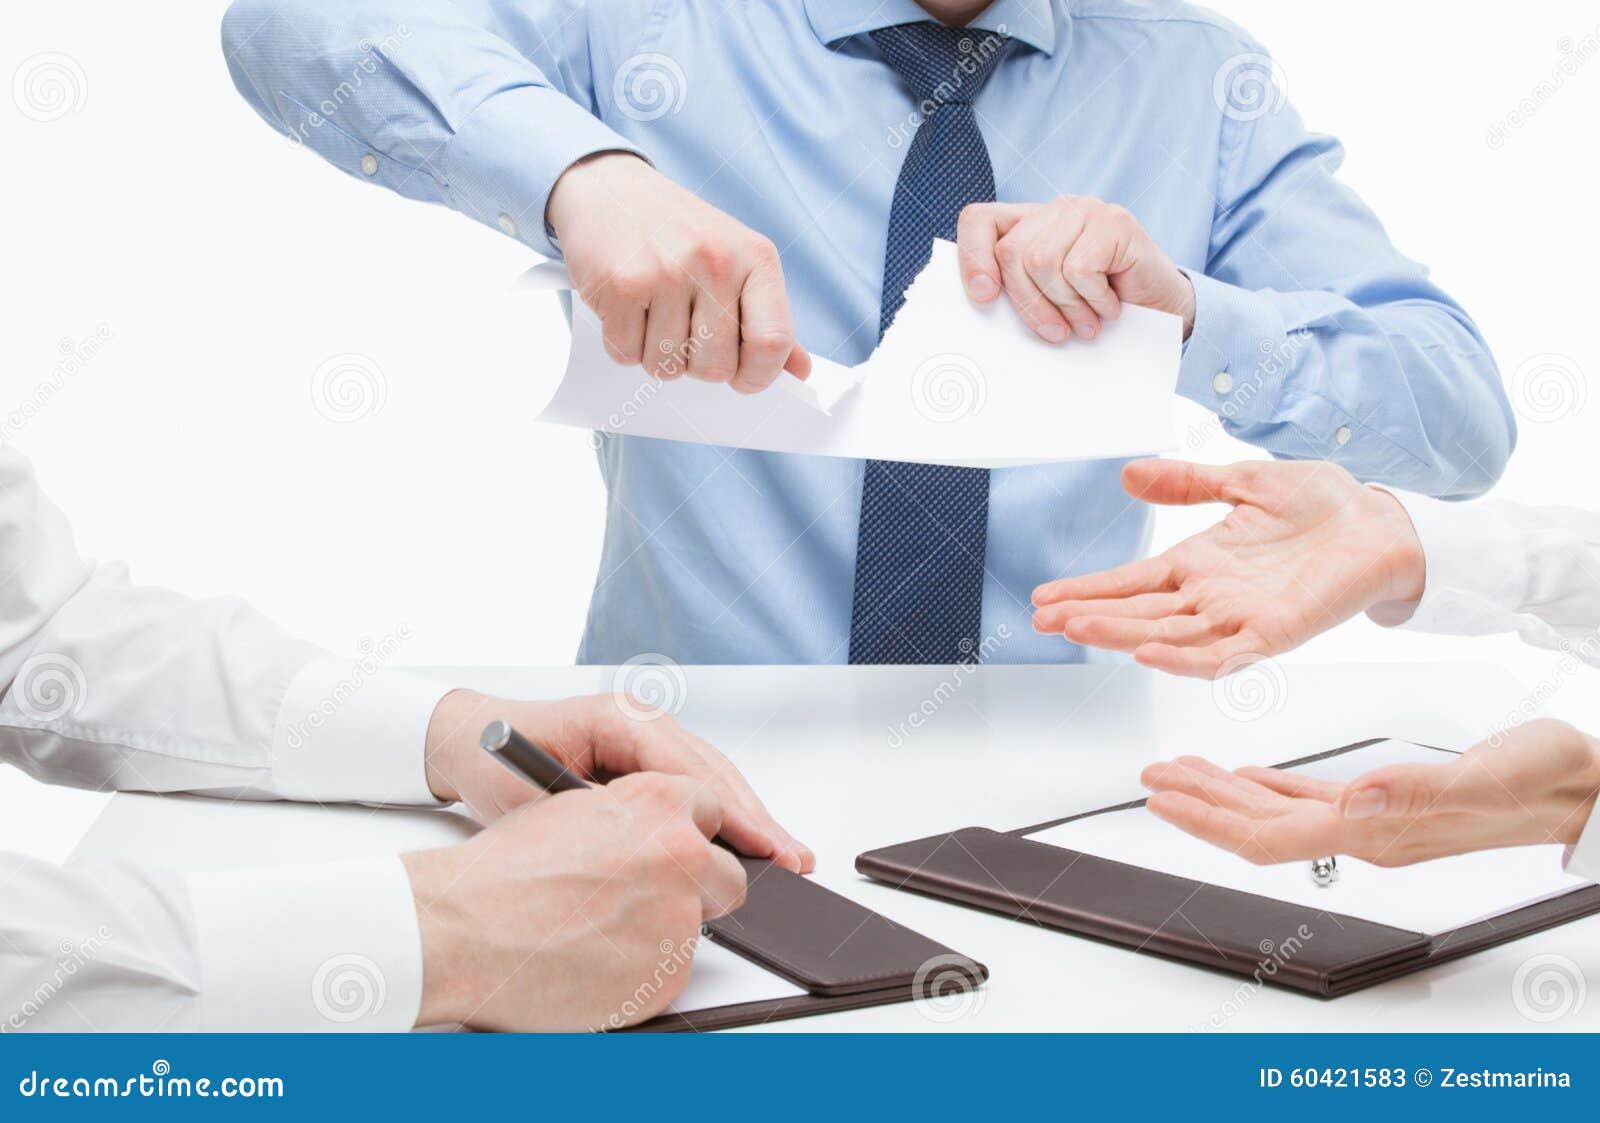 Bedrijfsmensen wreed tearing documenten